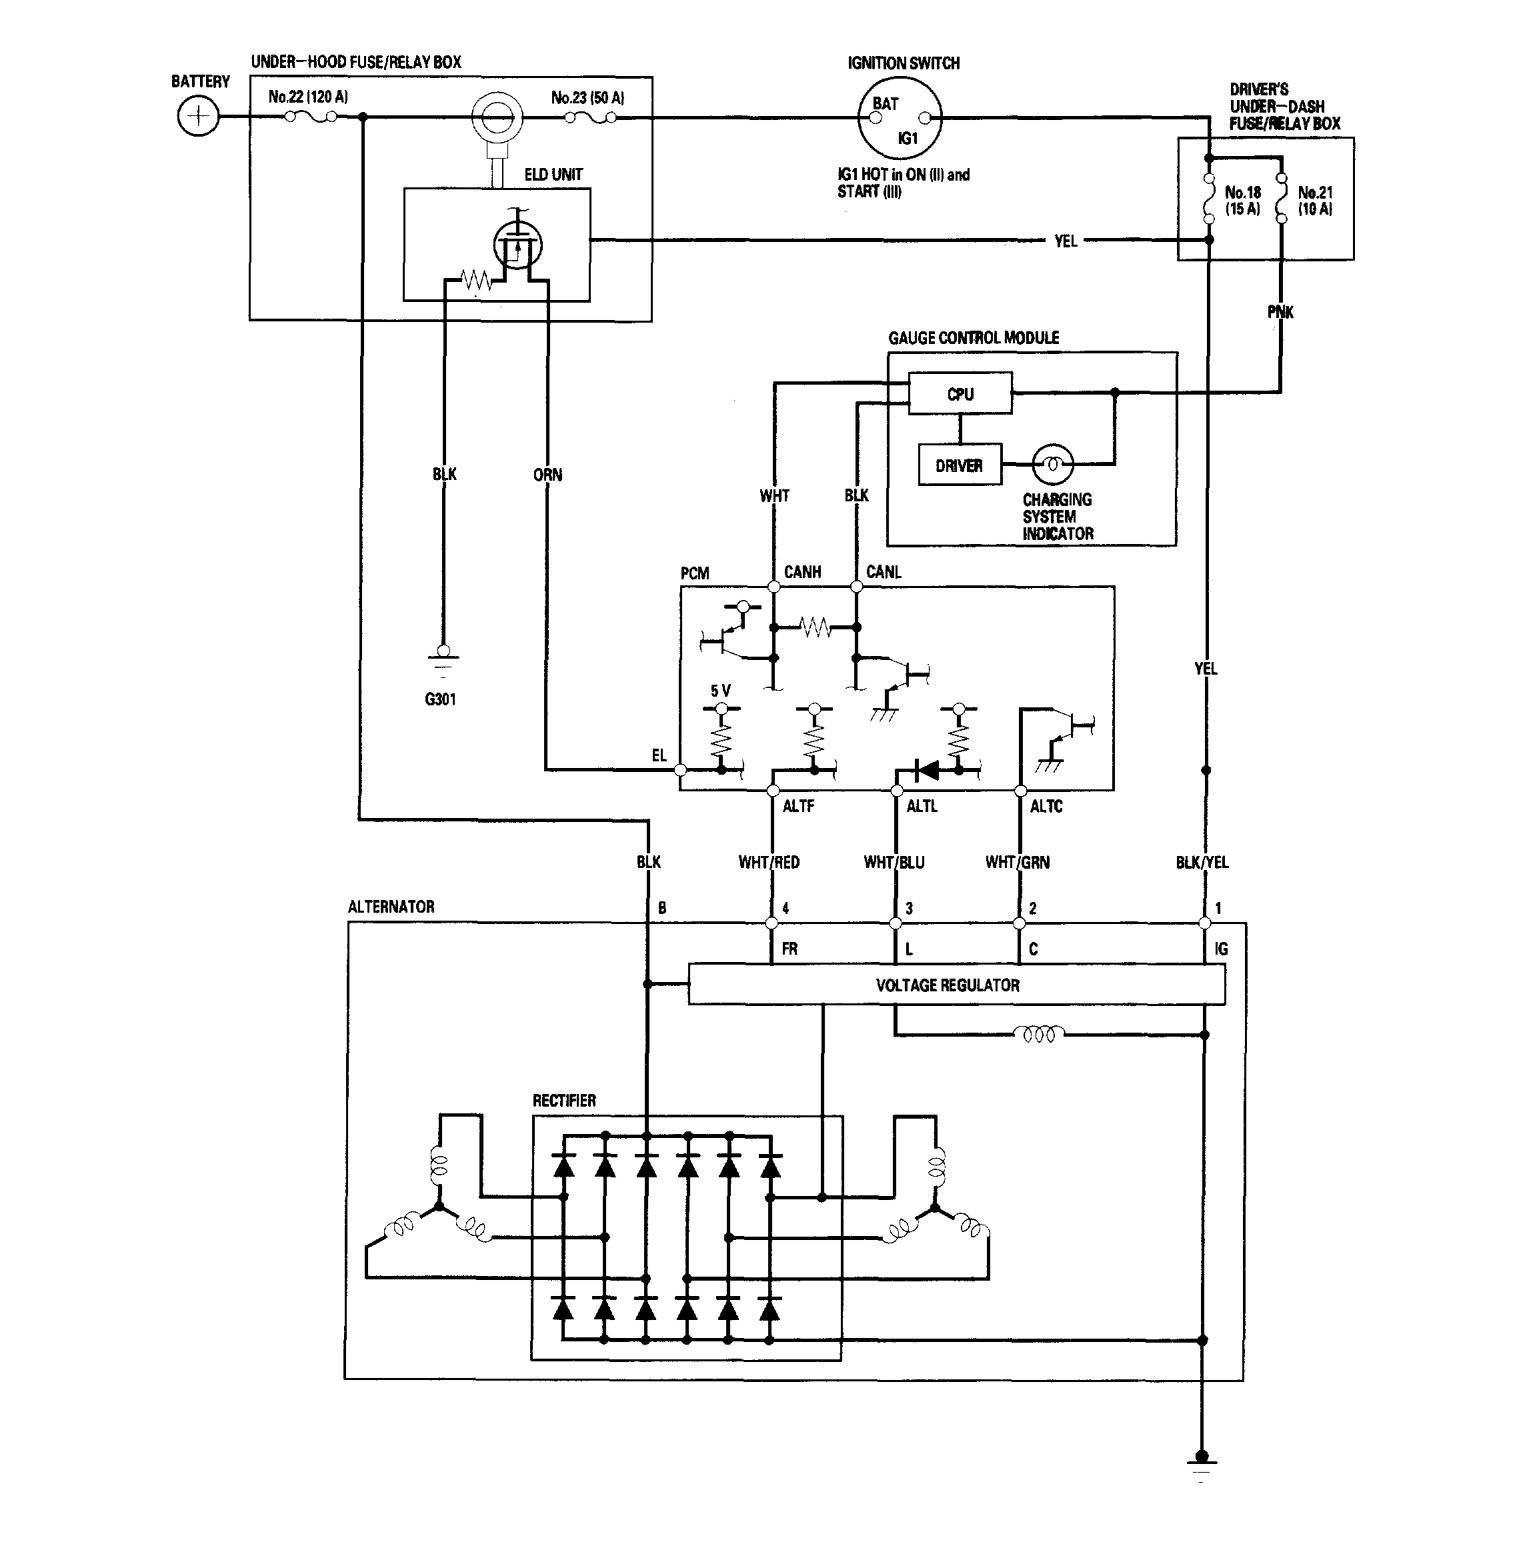 1990 Volvo 740 Gle Engine Diagram Wagon Wiring